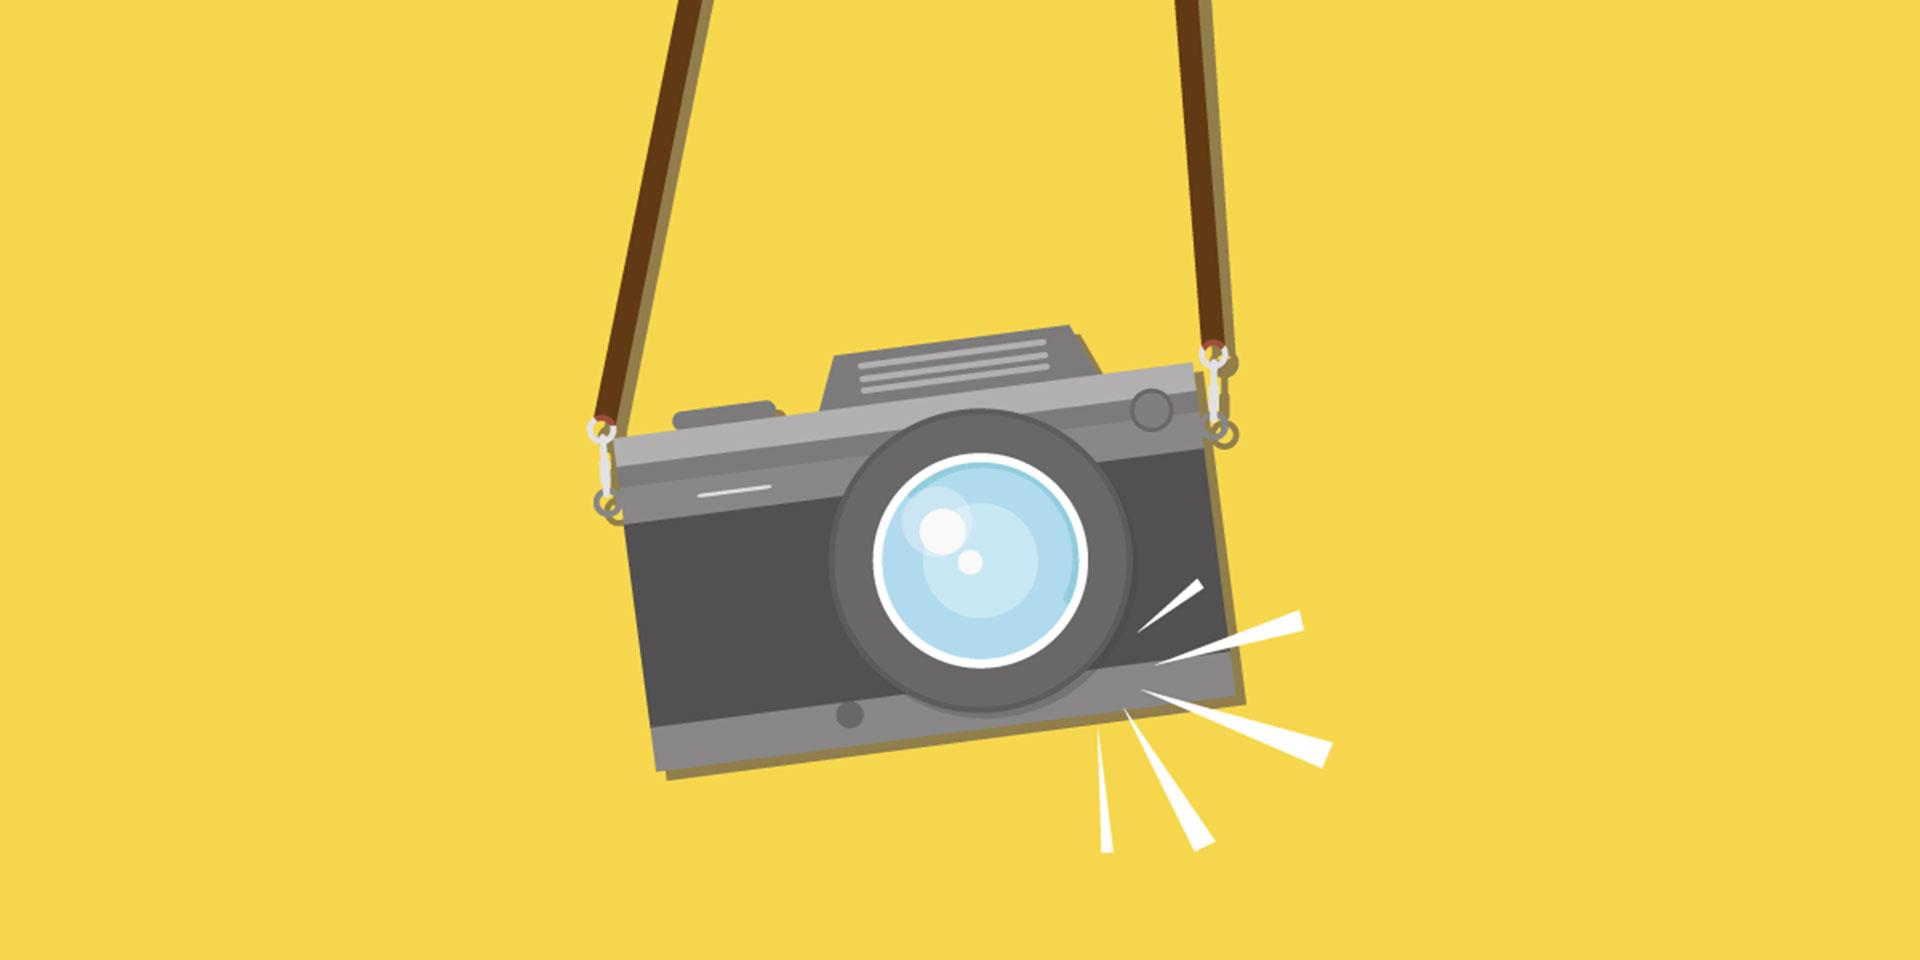 SONYのミラーレス一眼カメラ「NEX-5T」を購入した理由